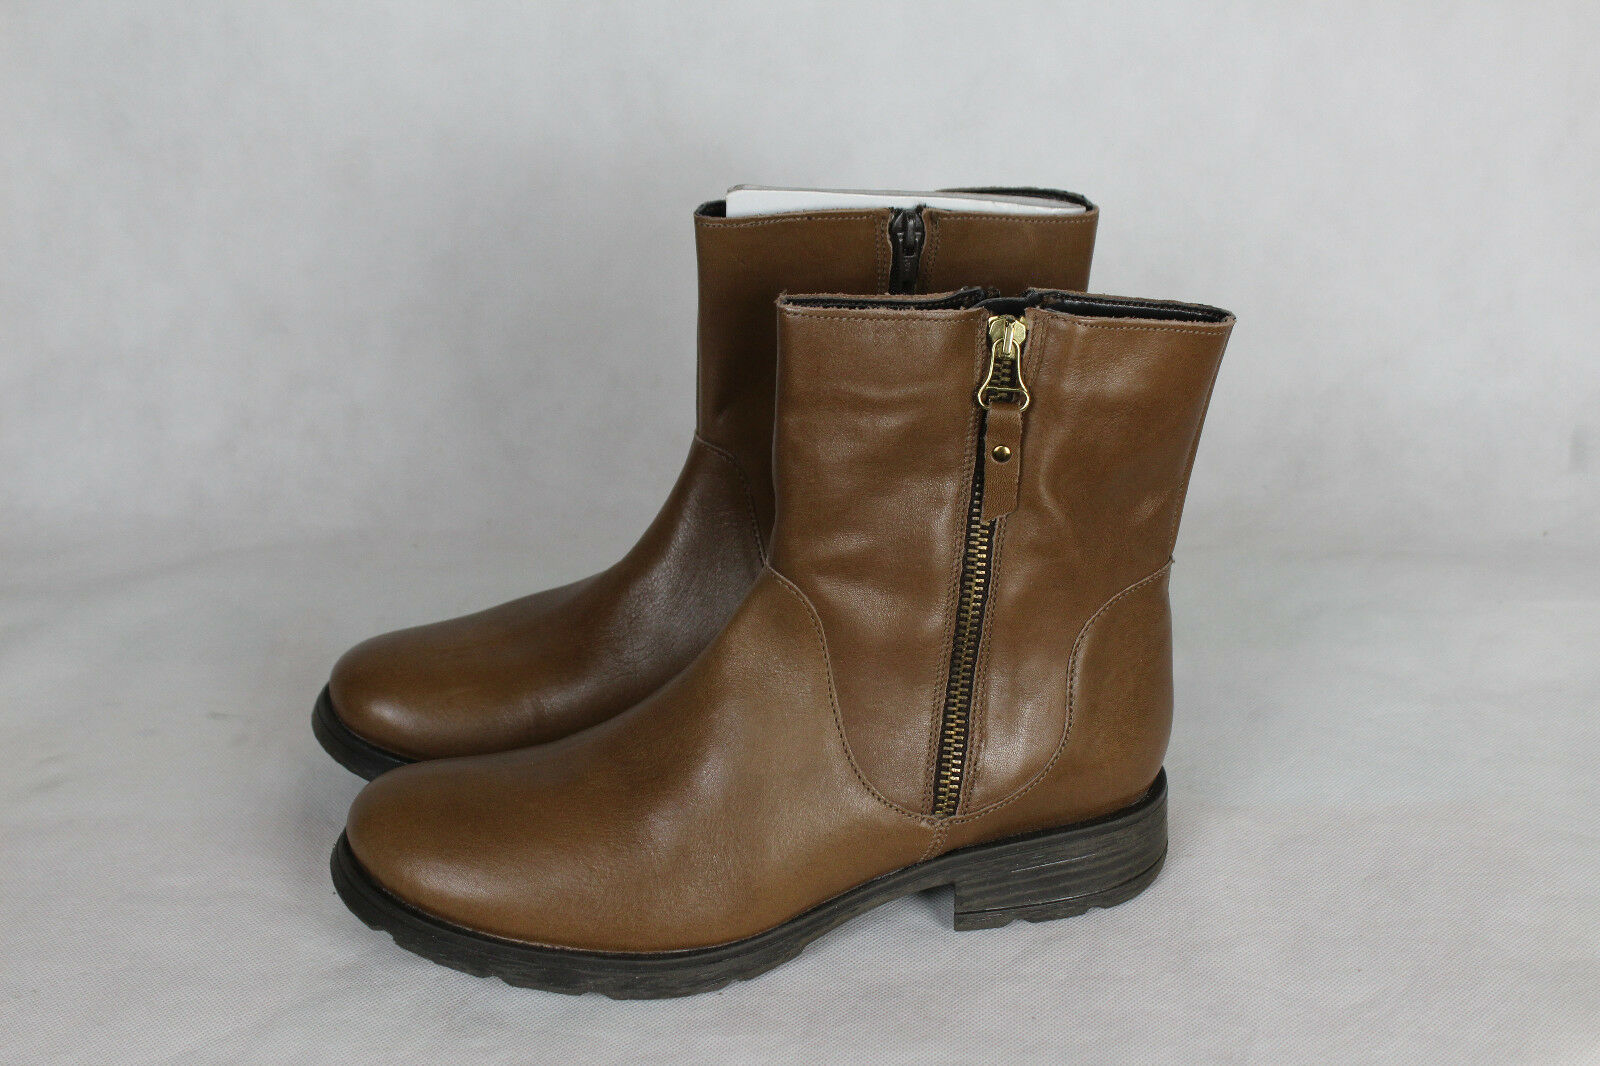 Roberto Roberto Roberto Carrioli Leder Schuhe Stiefeletten Gr.39,neu.LP 42e0be